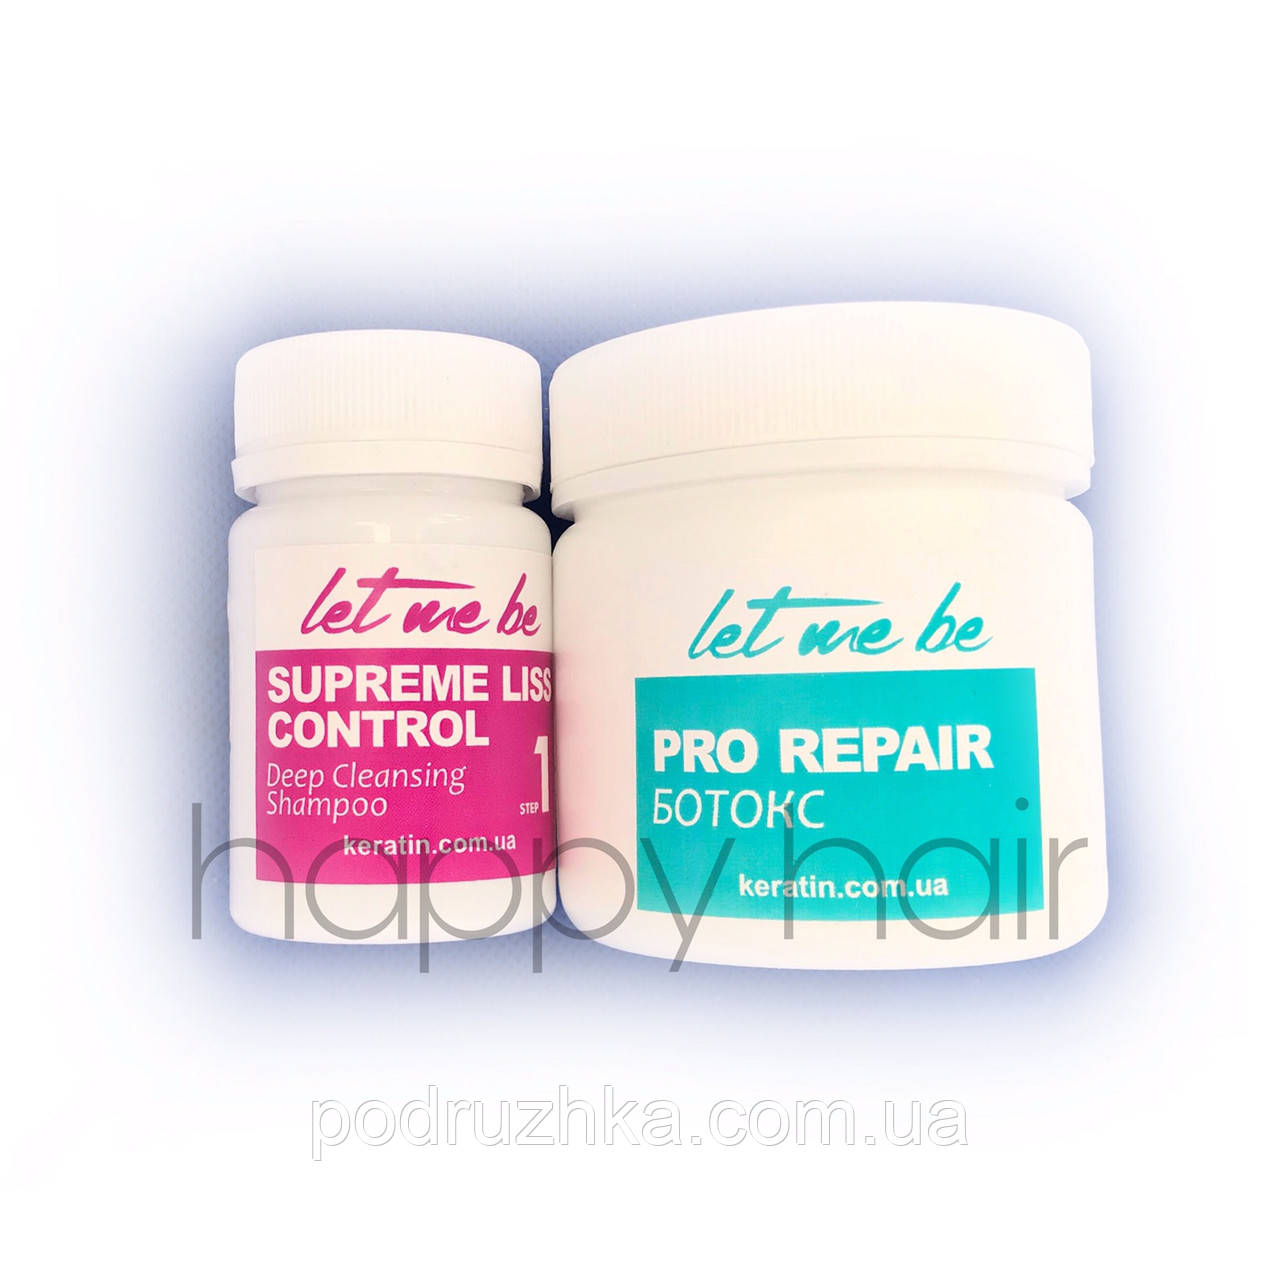 Let me be B-Btox Pro Repair Набор холодный ботекс для волос 50/100 мл (разлив)